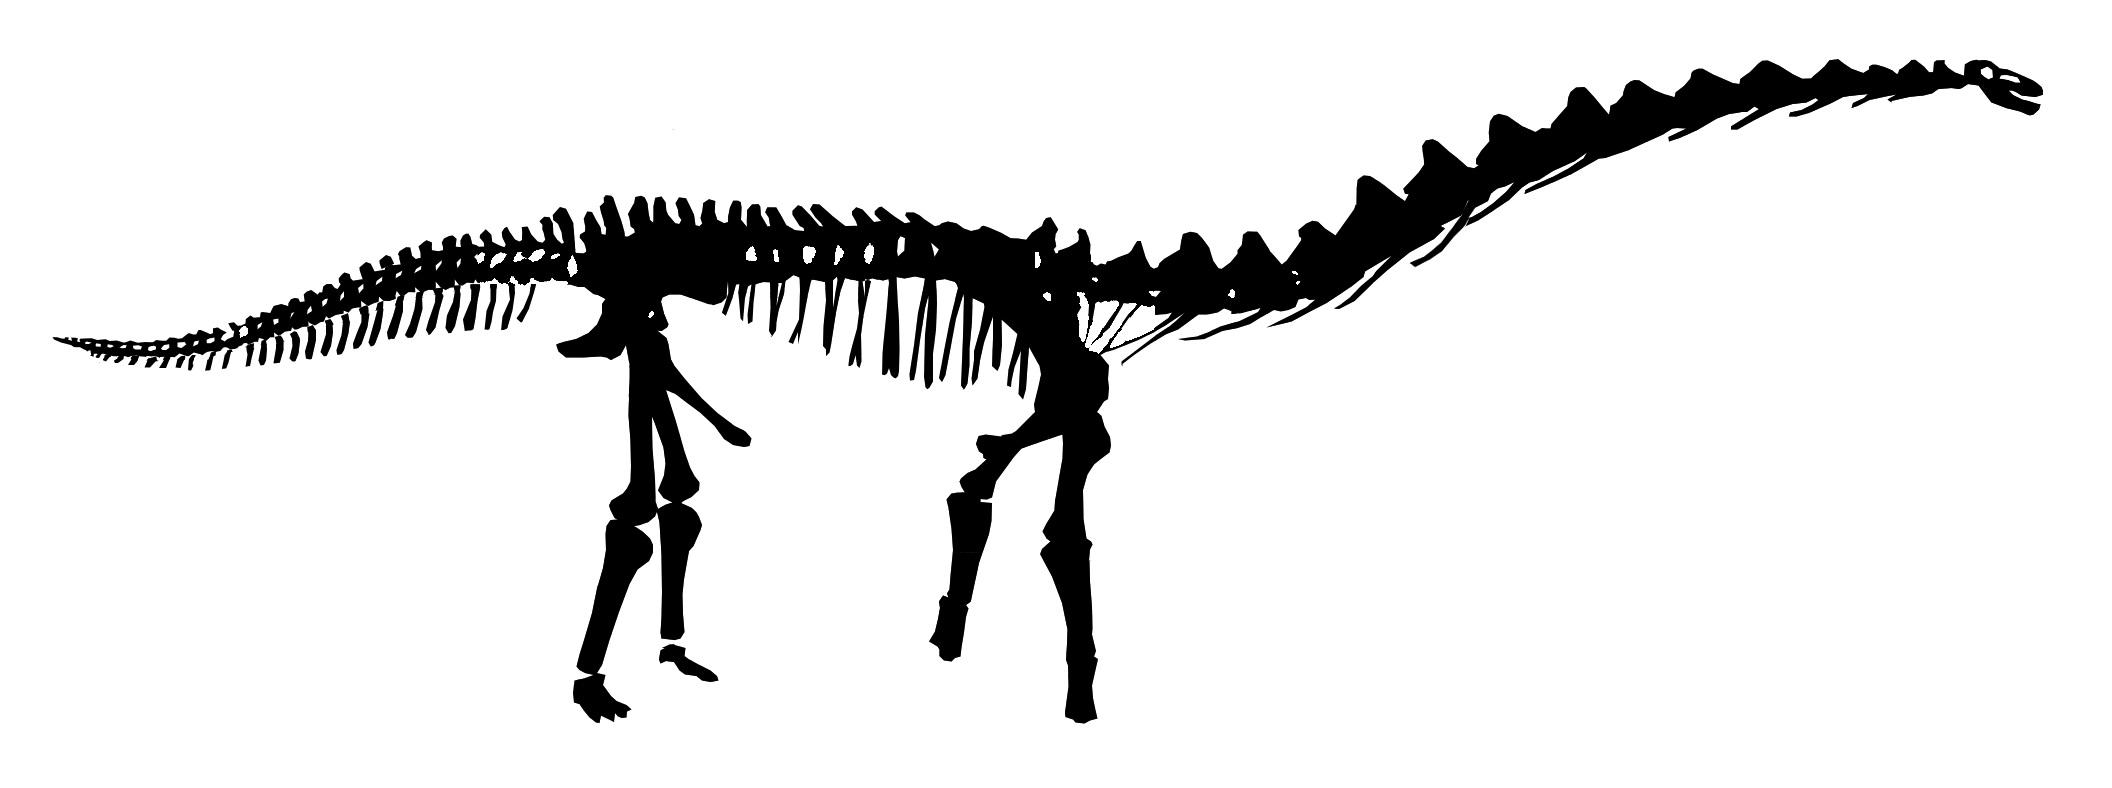 T Rex Skull Silhouette At Getdrawings